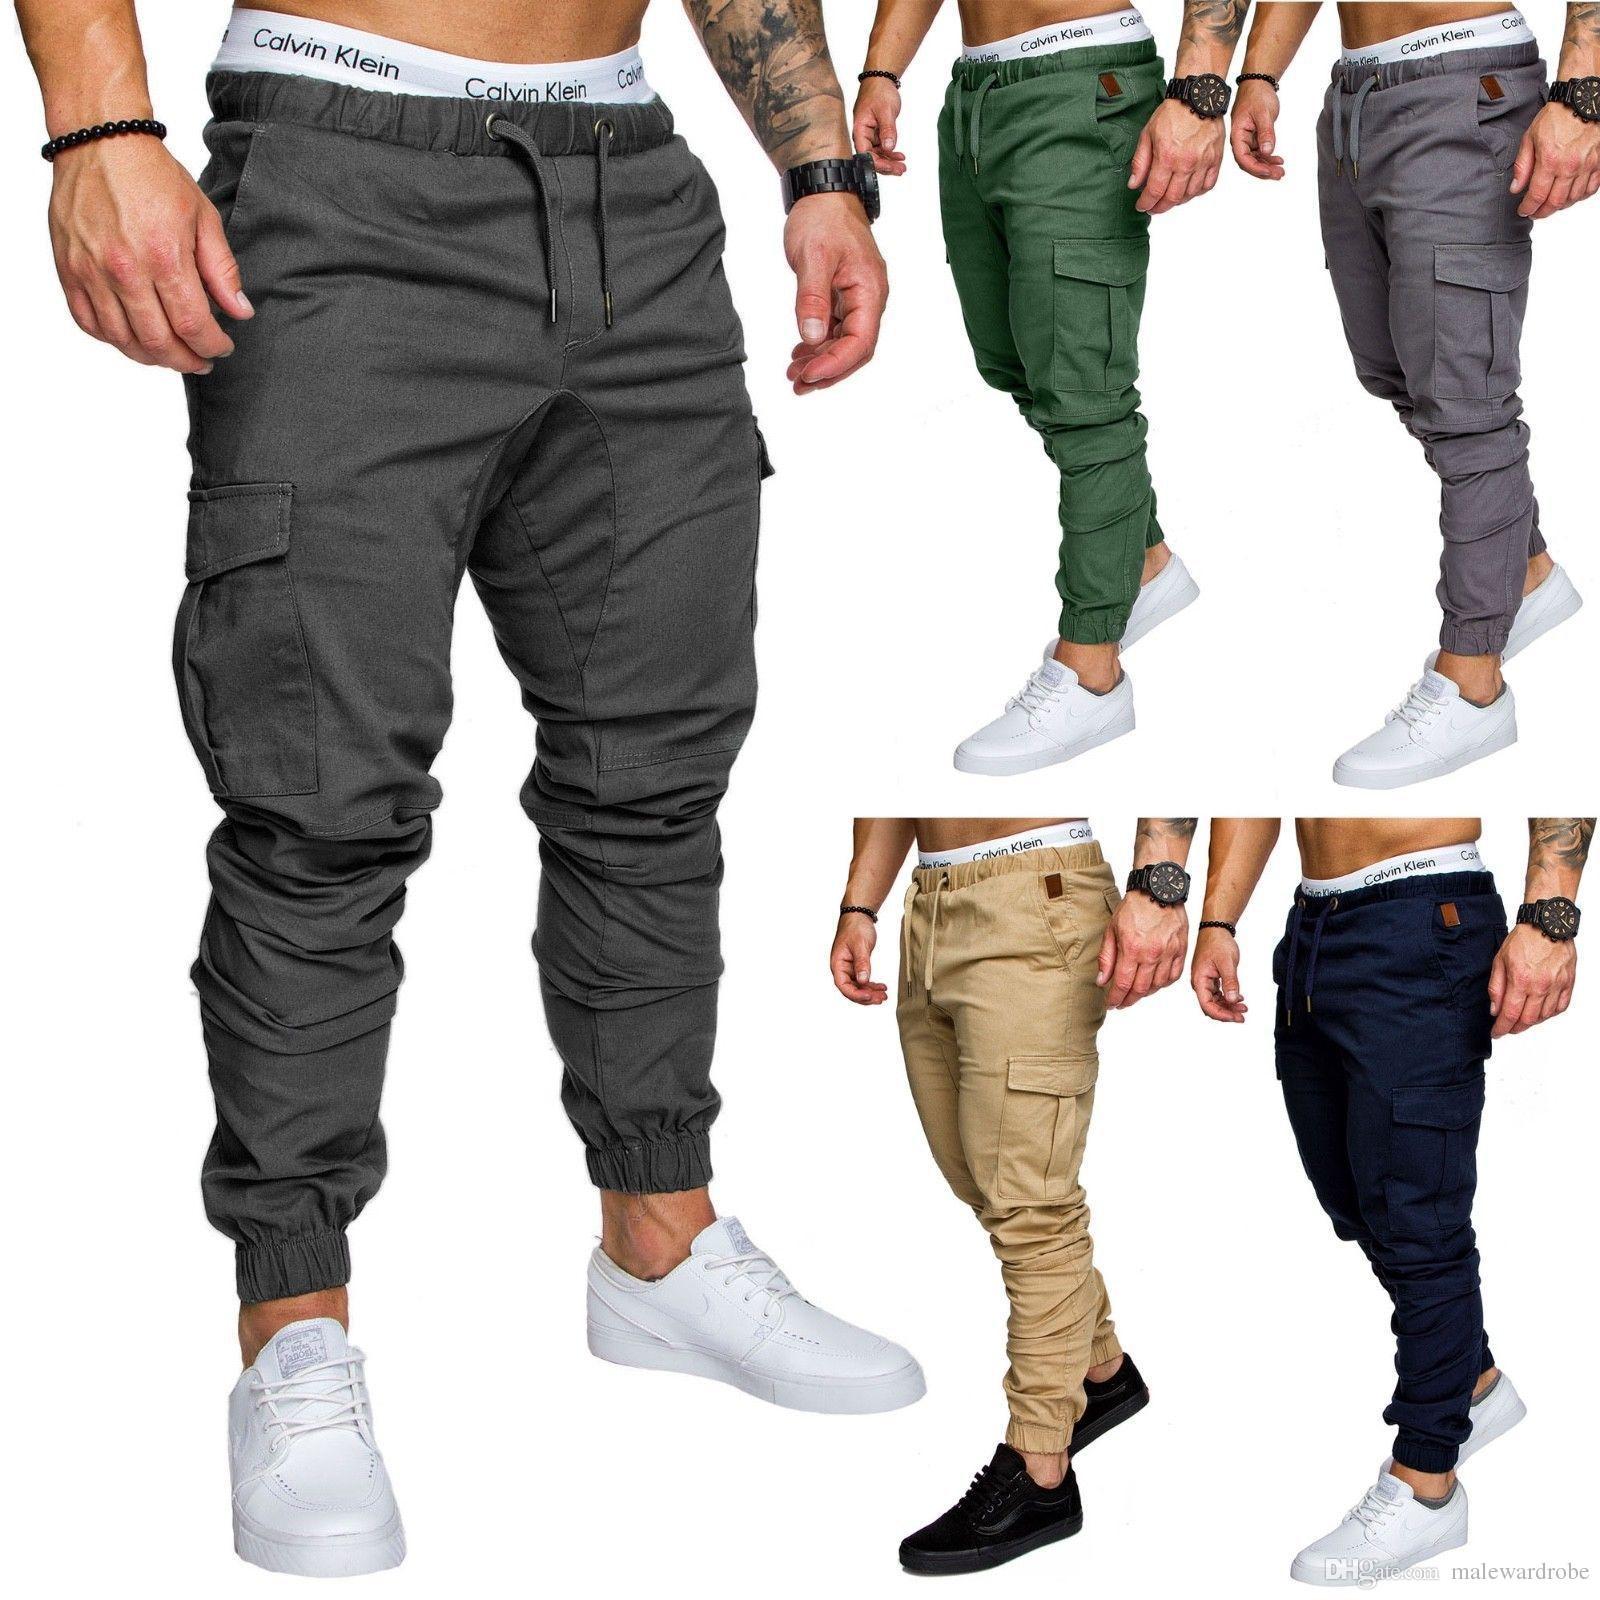 3e72044148d Compre Pantalones De Carga Para Hombre Bolsillos Flojos Ocasionales  Bolsillos Pantalones Largos De Diseño Ropa Para Hombres A  47.14 Del  Malewardrobe ...